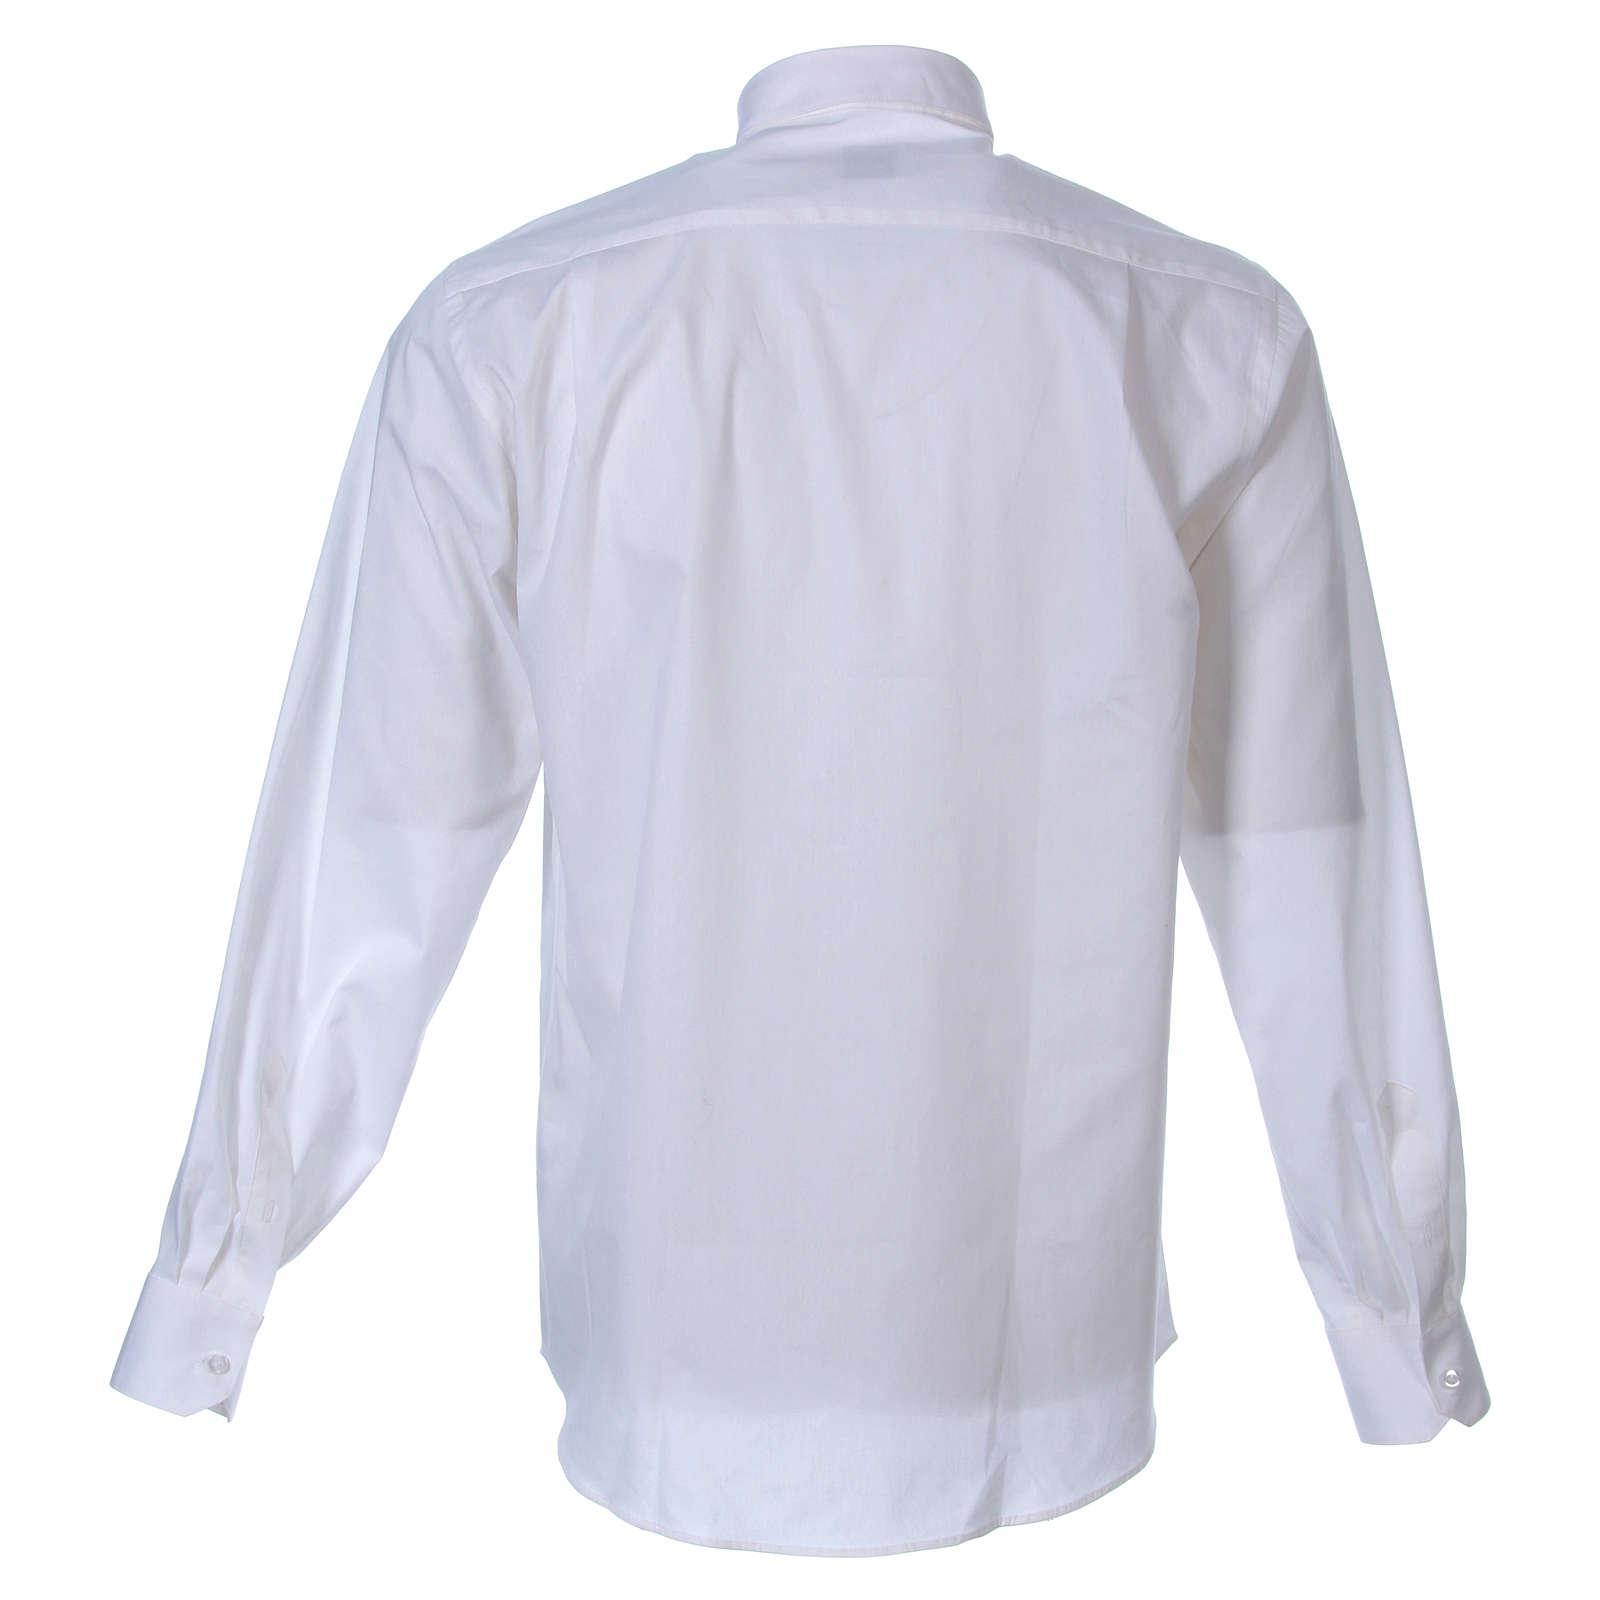 STOCK Camisa m. larga popelina blanca 4